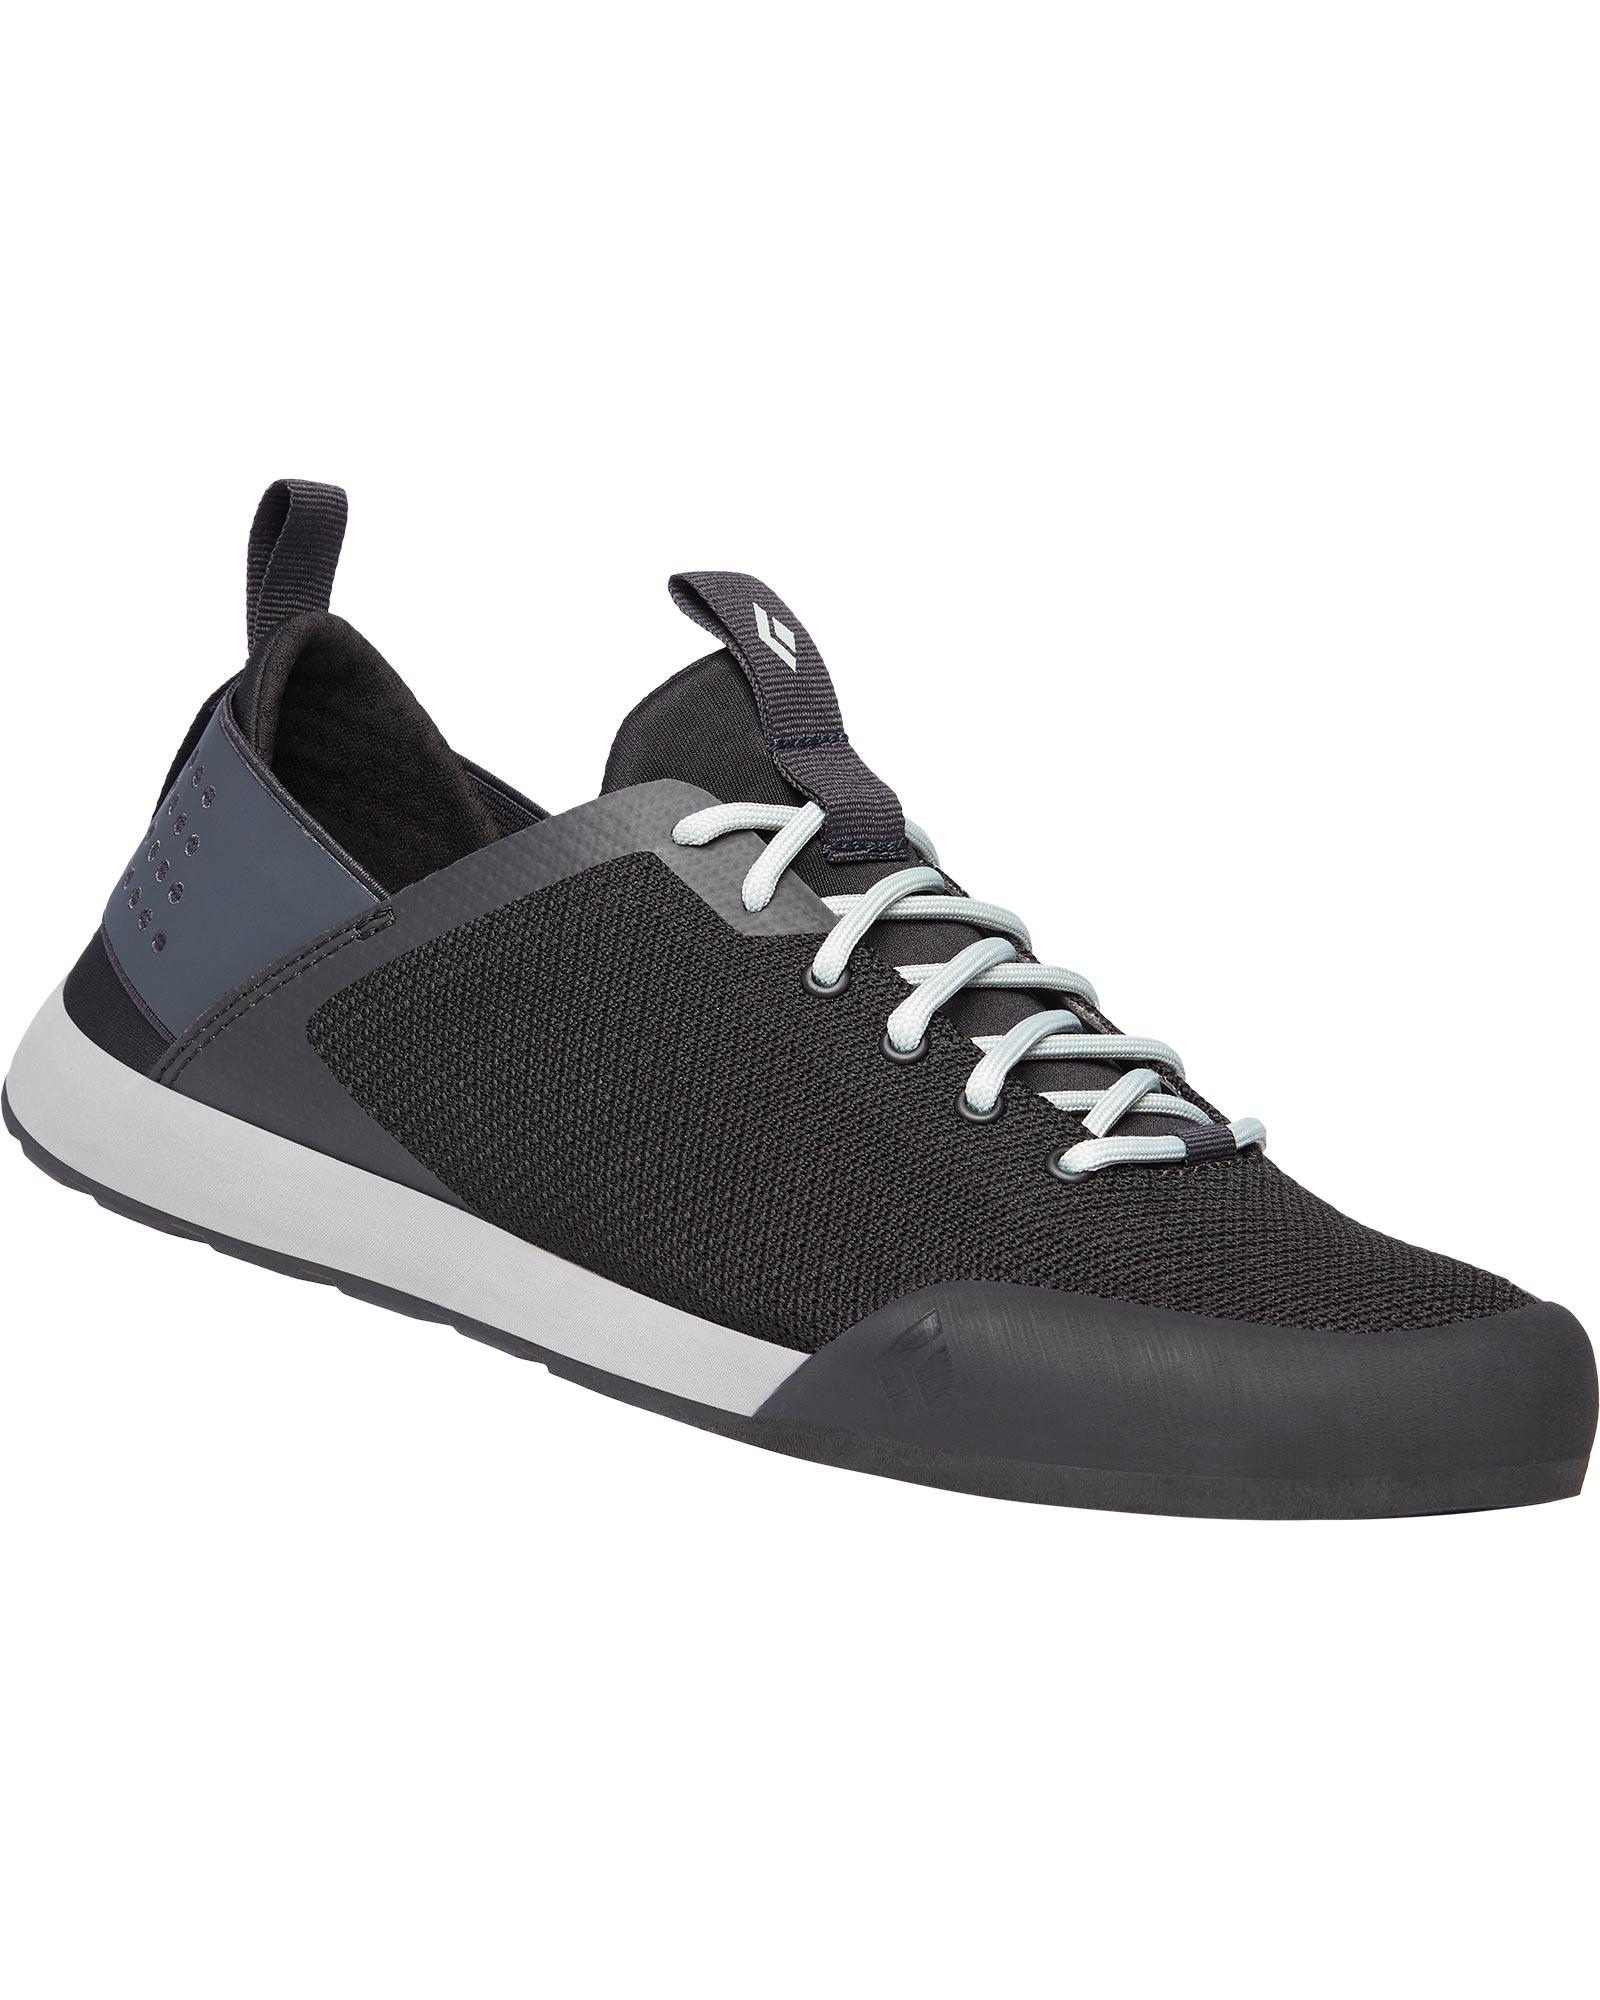 Black Diamond Women's Session Approach Shoes 0